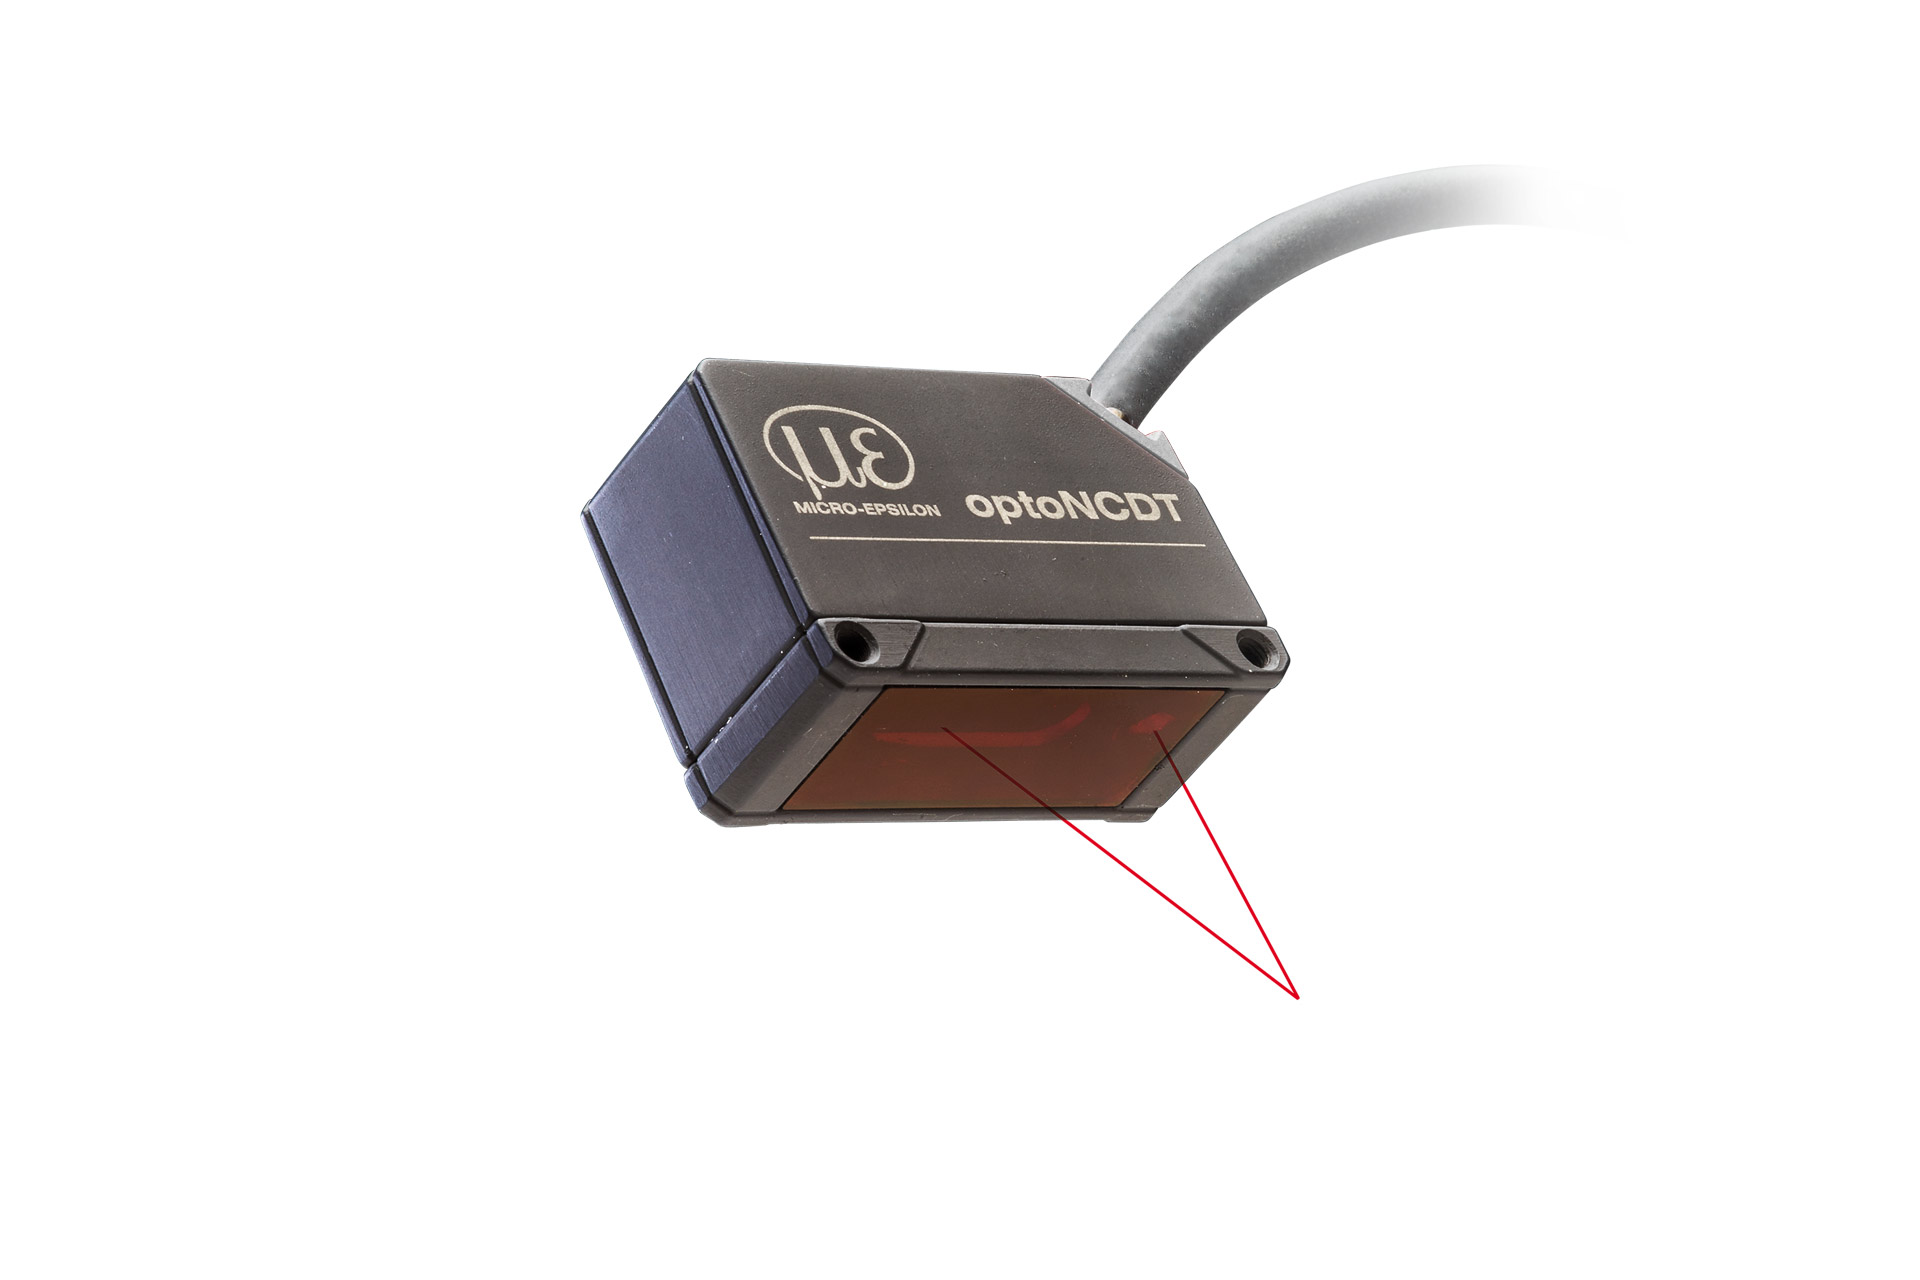 ILD1320-50 Miniatur-Laser-Wegsensor